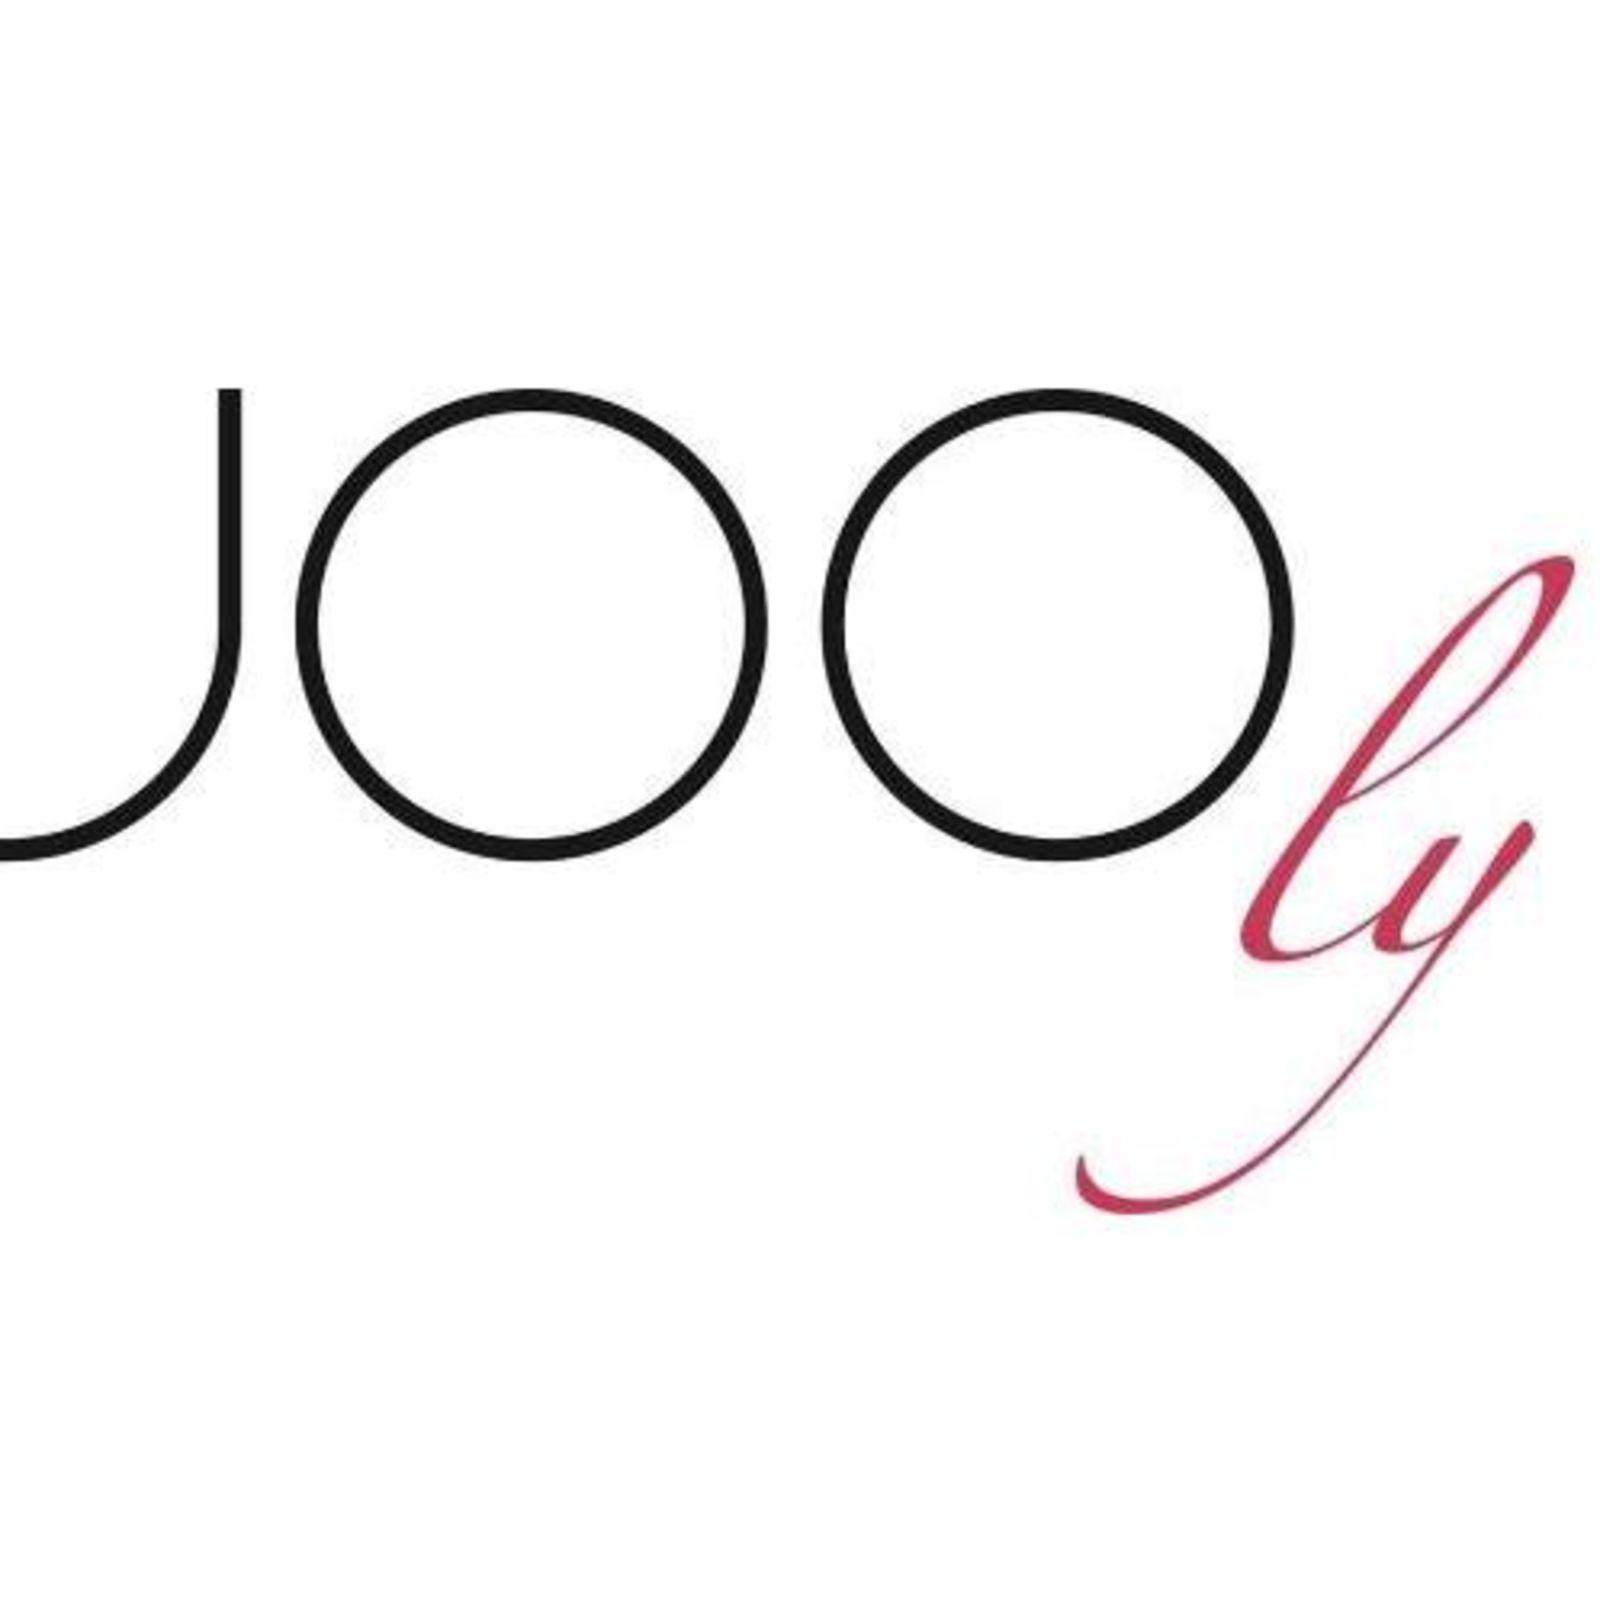 JOOly Eyewear